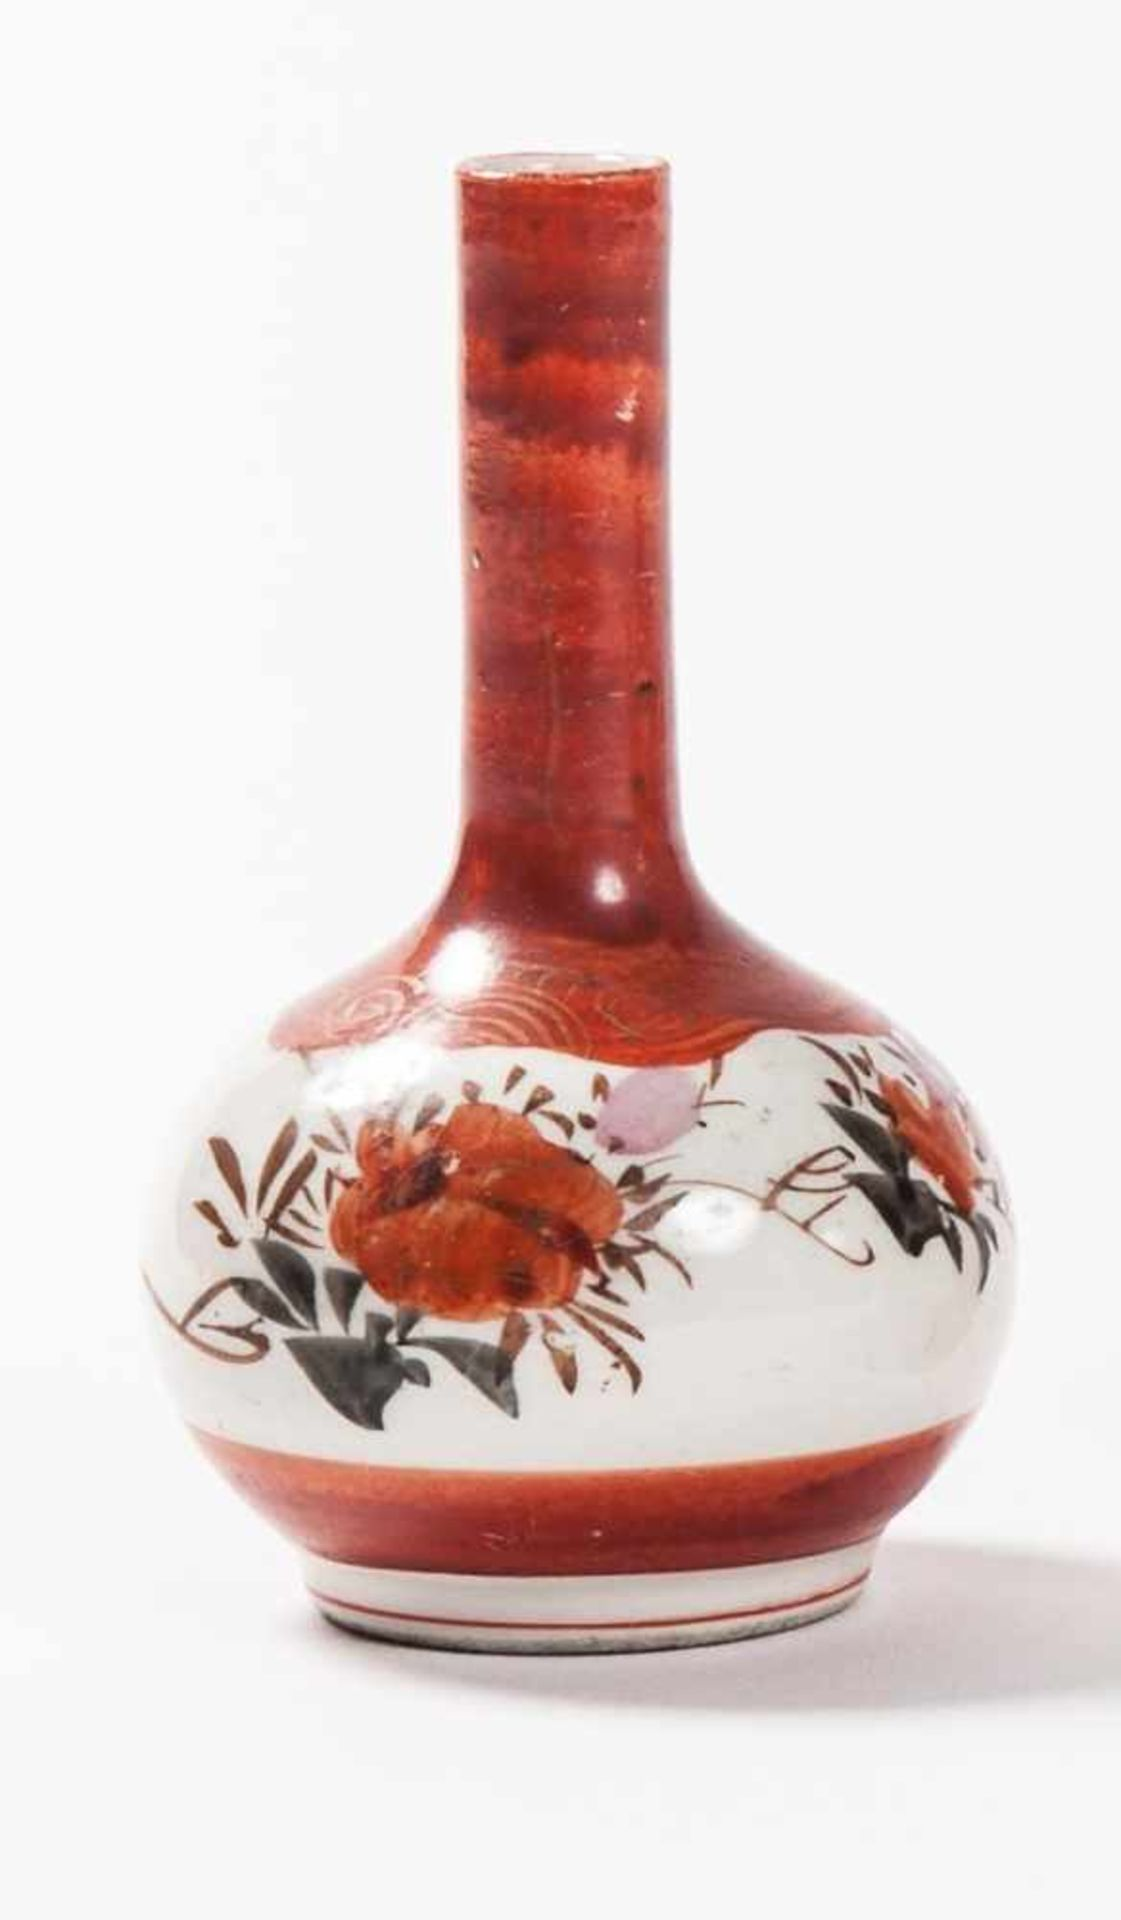 Konvolut Bestehend aus 1 Kerzenständer,1 Porzellanvase Kutani-Porzellan. Japan, 19. Jh. a) - Image 3 of 5